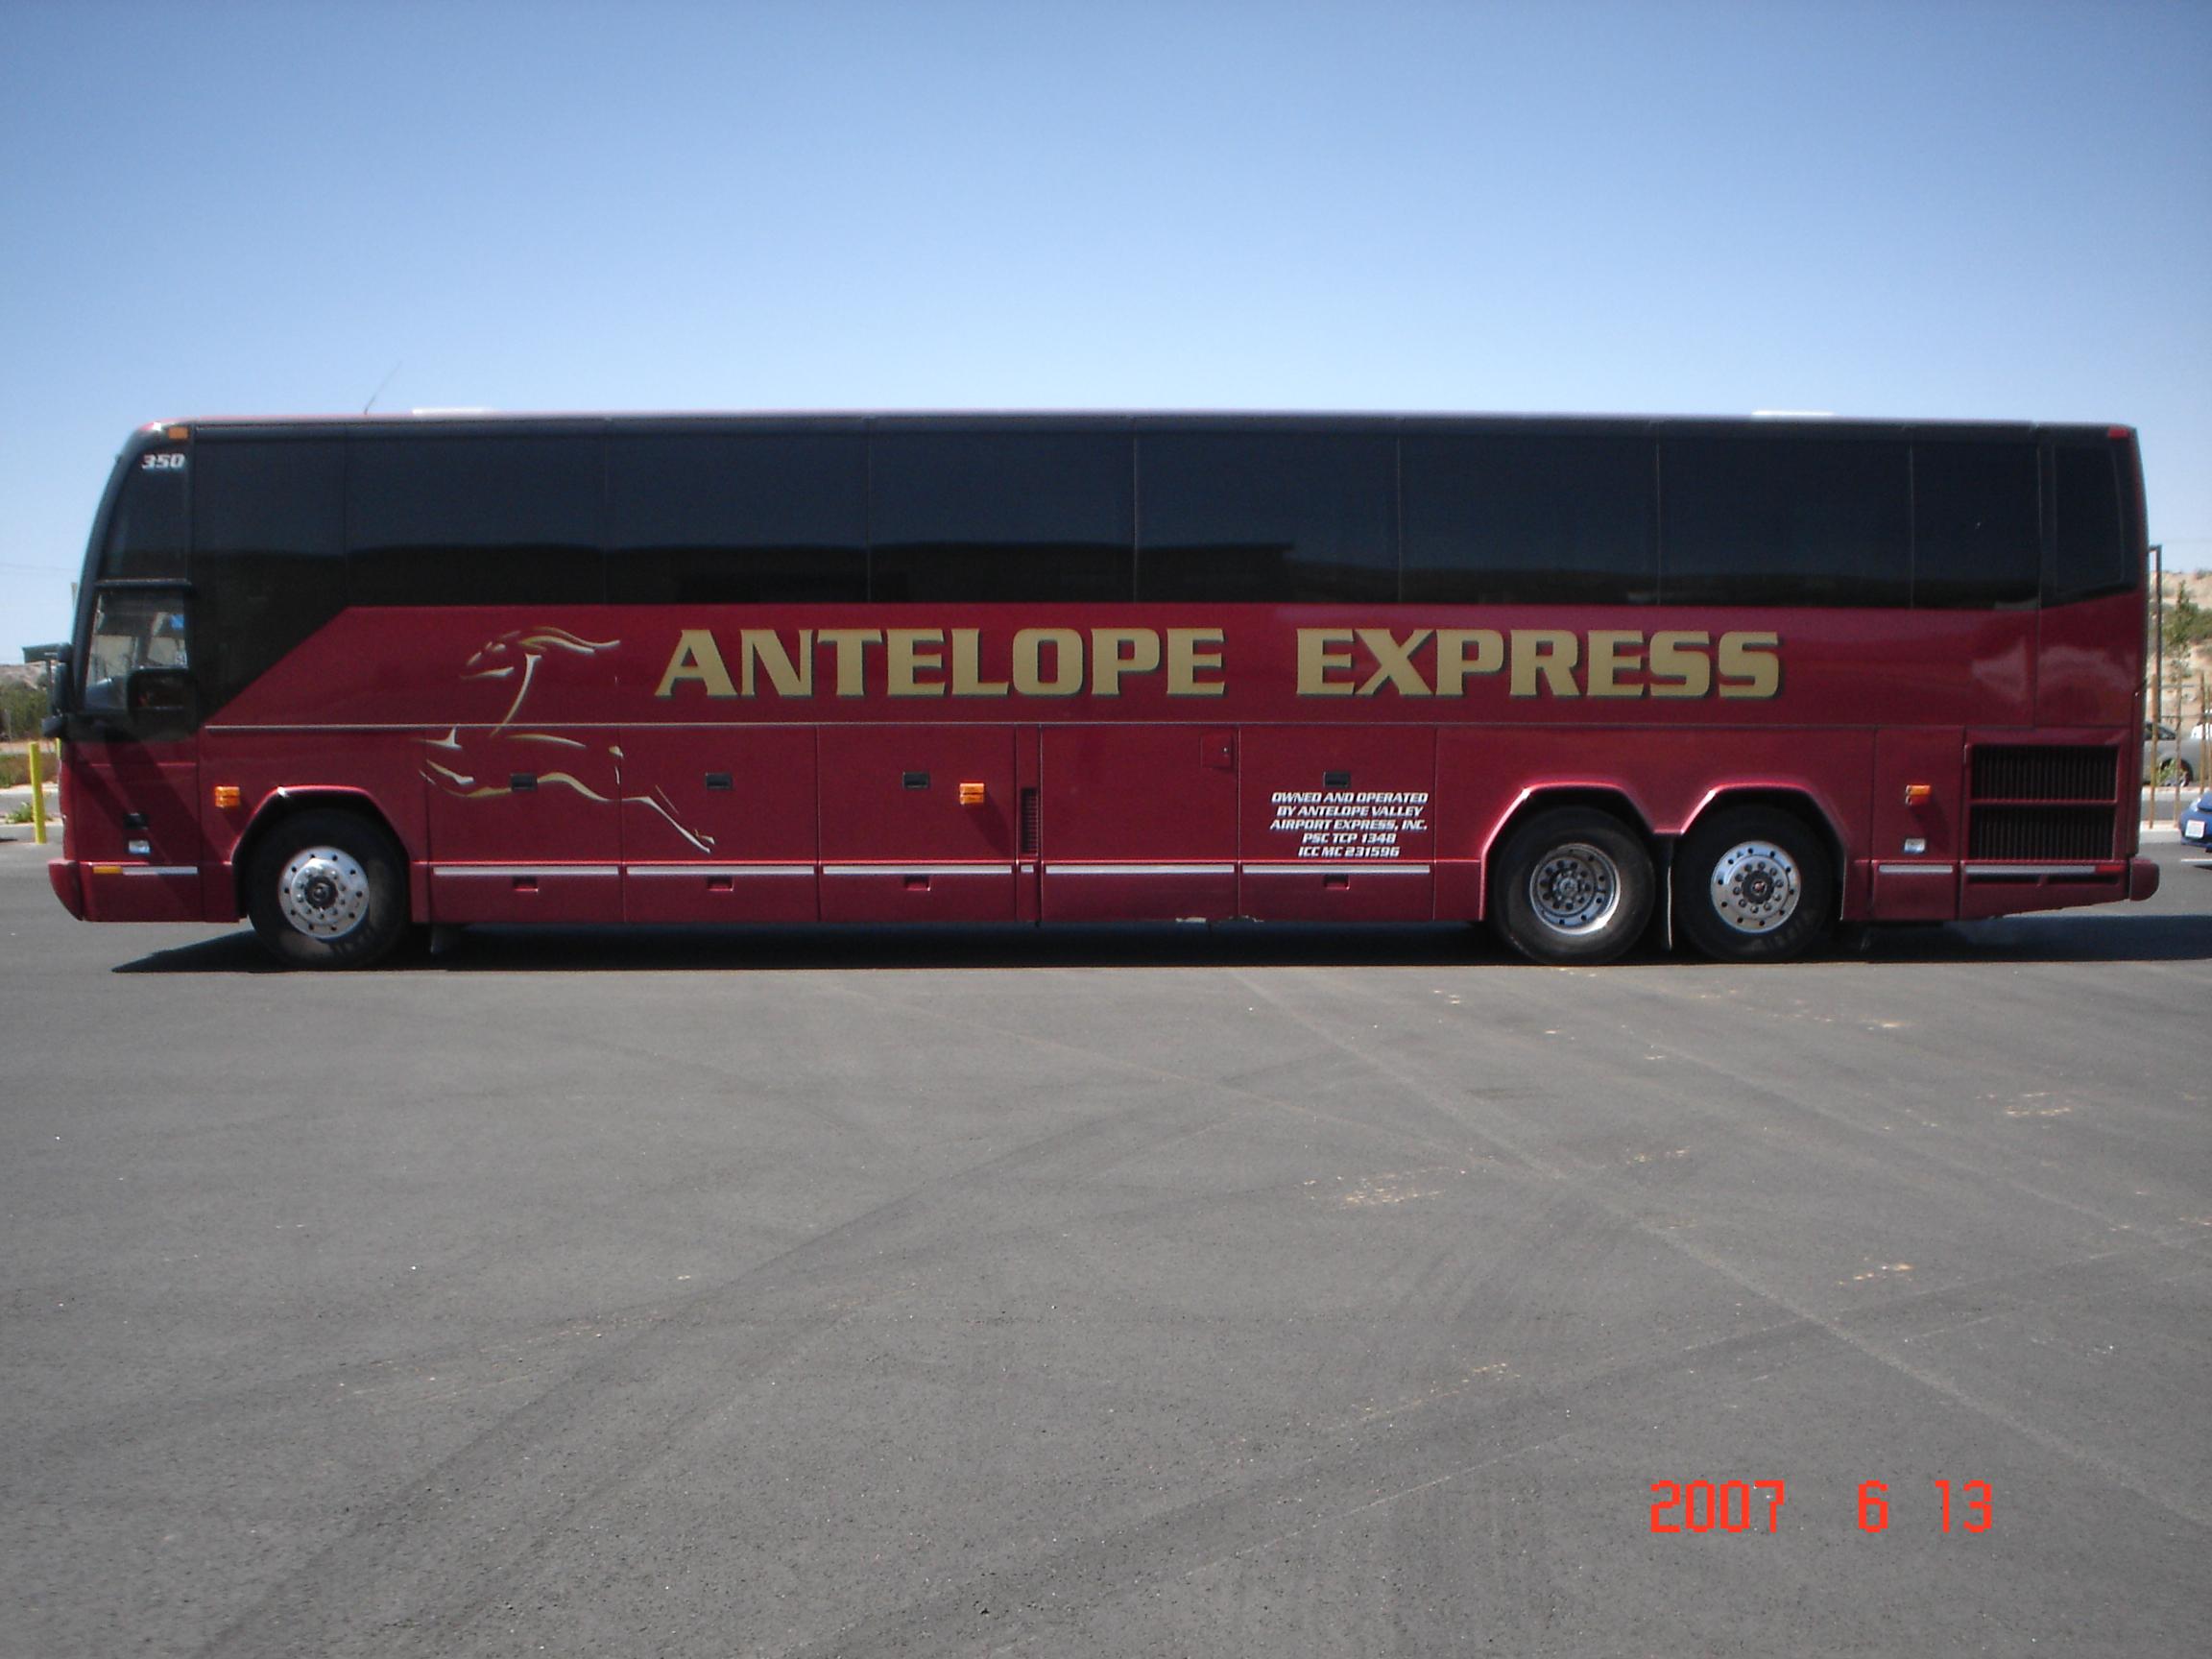 Antelope Express 332 W Avenue S Ste A Palmdale Ca 93551